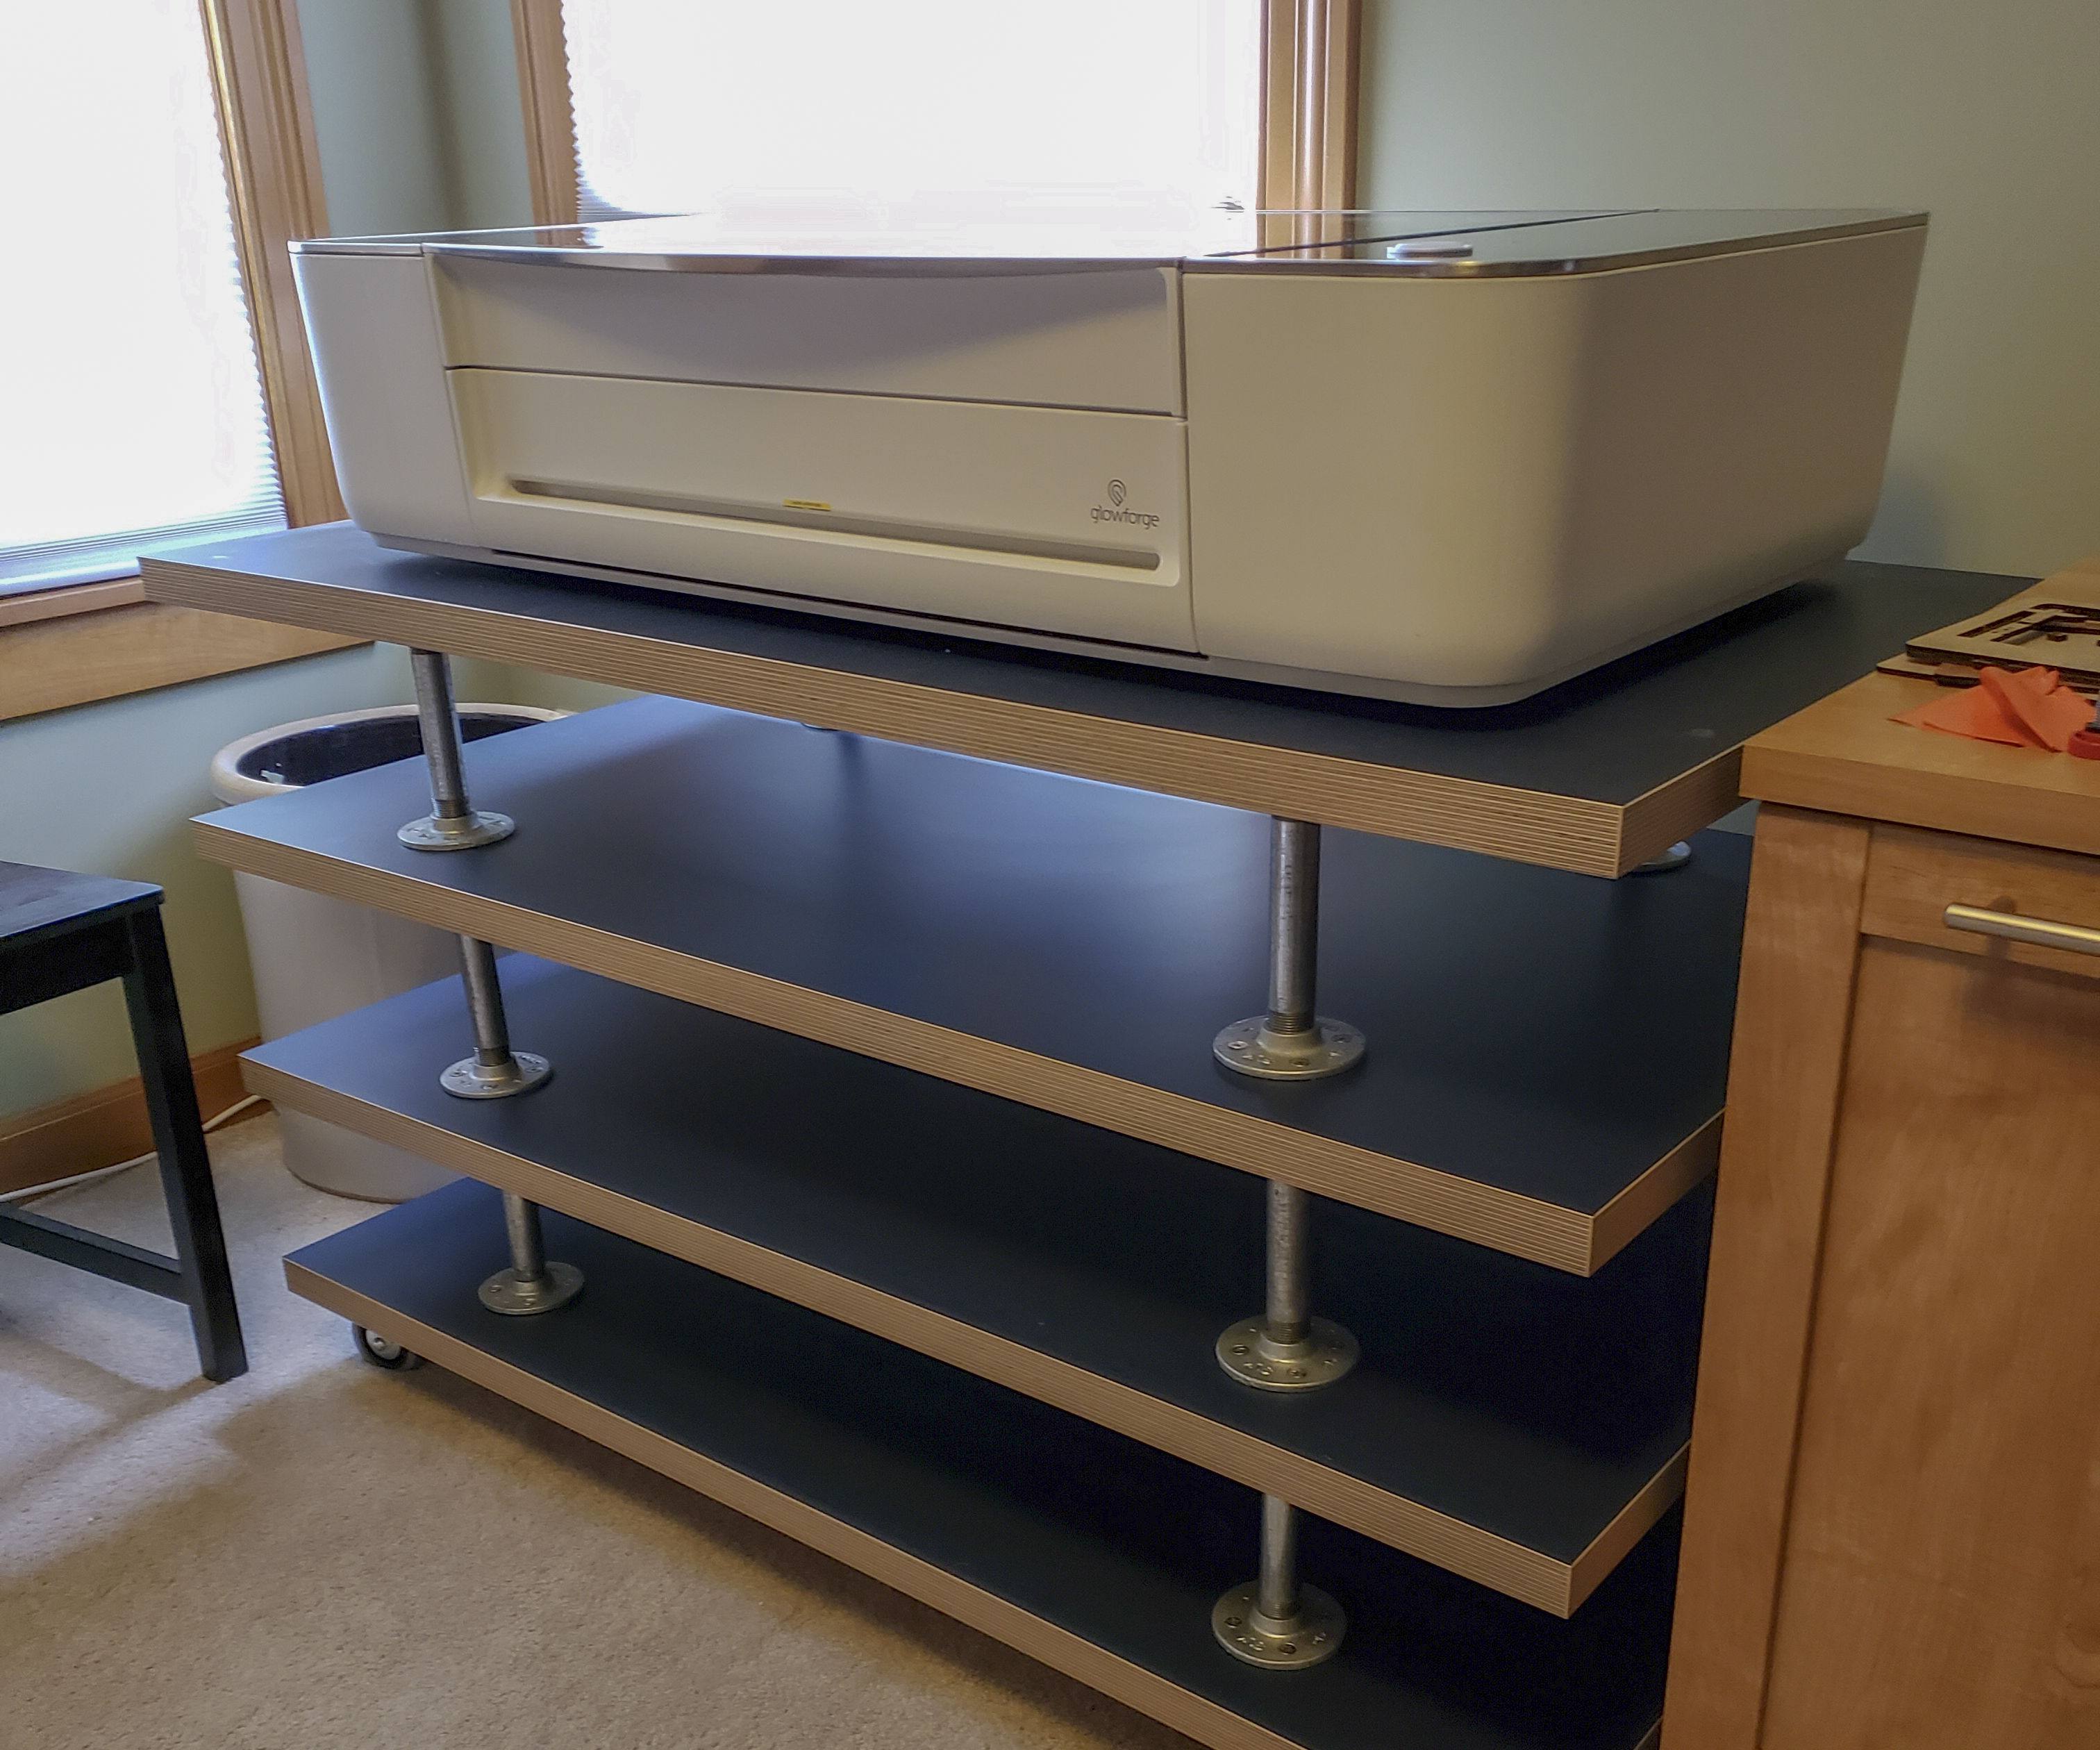 IKEA Tabletop Pipe Riser Multi-Level Glowforge Table